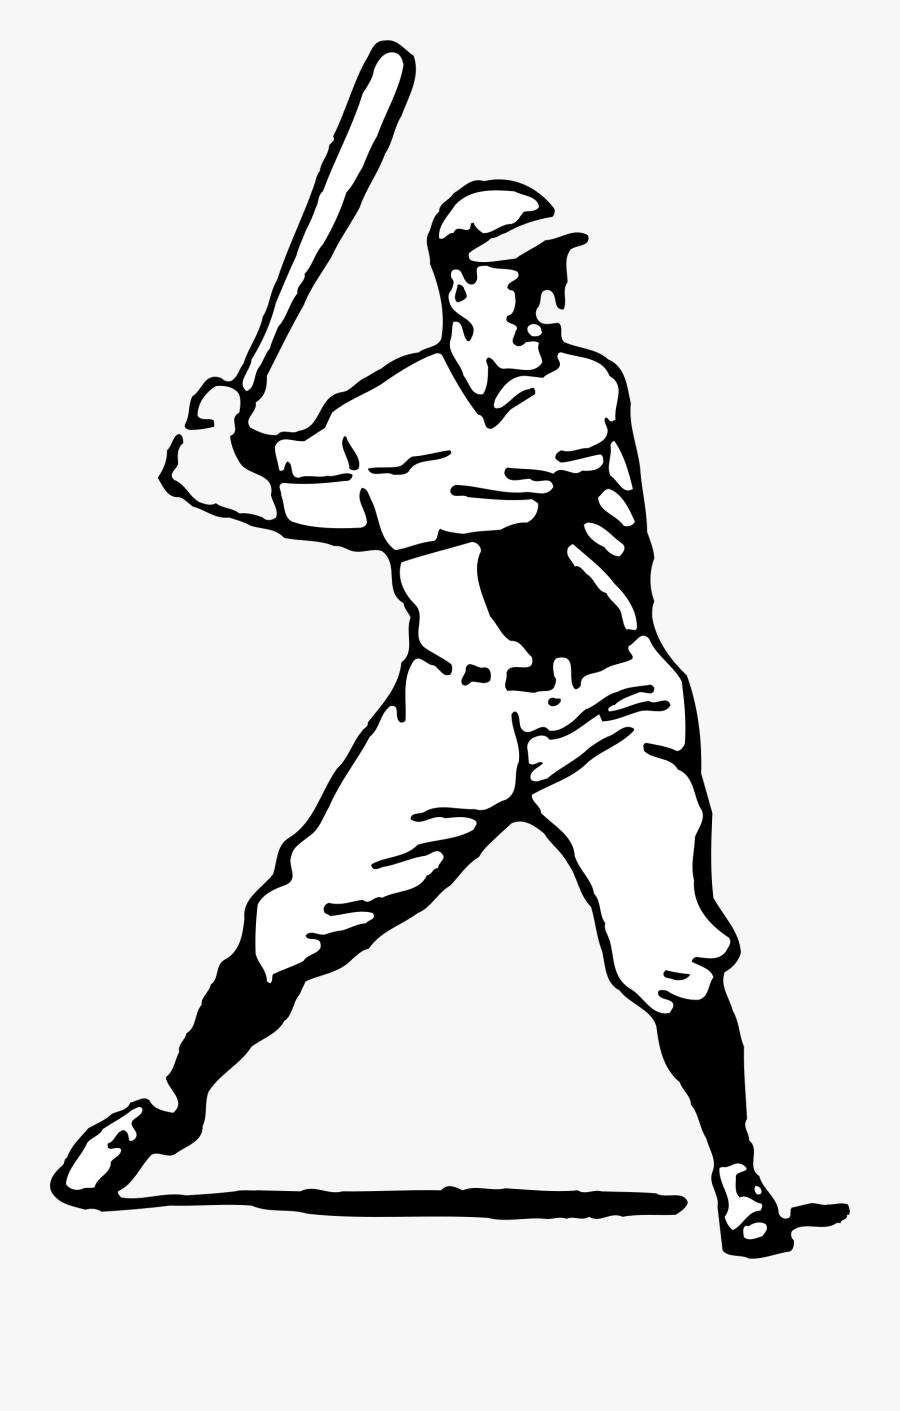 Monochrome Photography,arm,player - Vector Flat Baseball Batter, Transparent Clipart